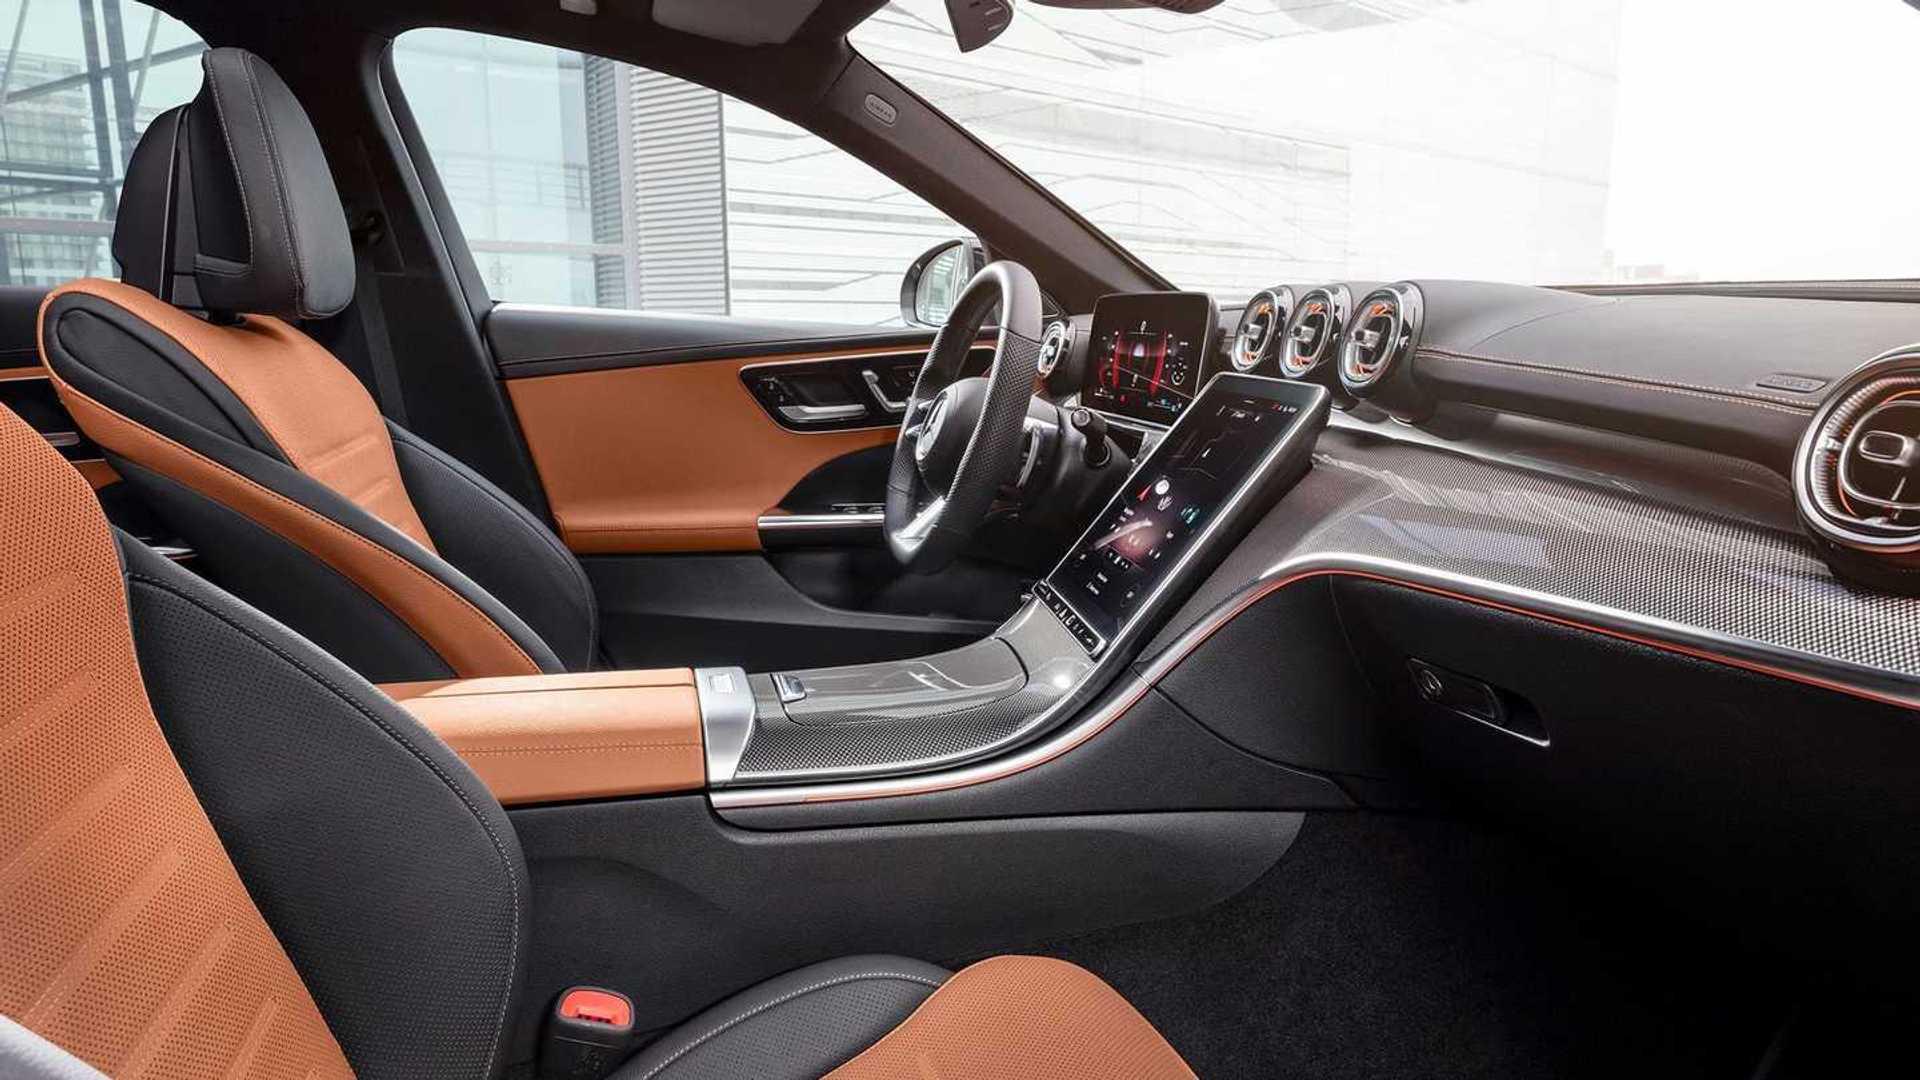 mercedes-c-klasse-limousine-2021.jpg